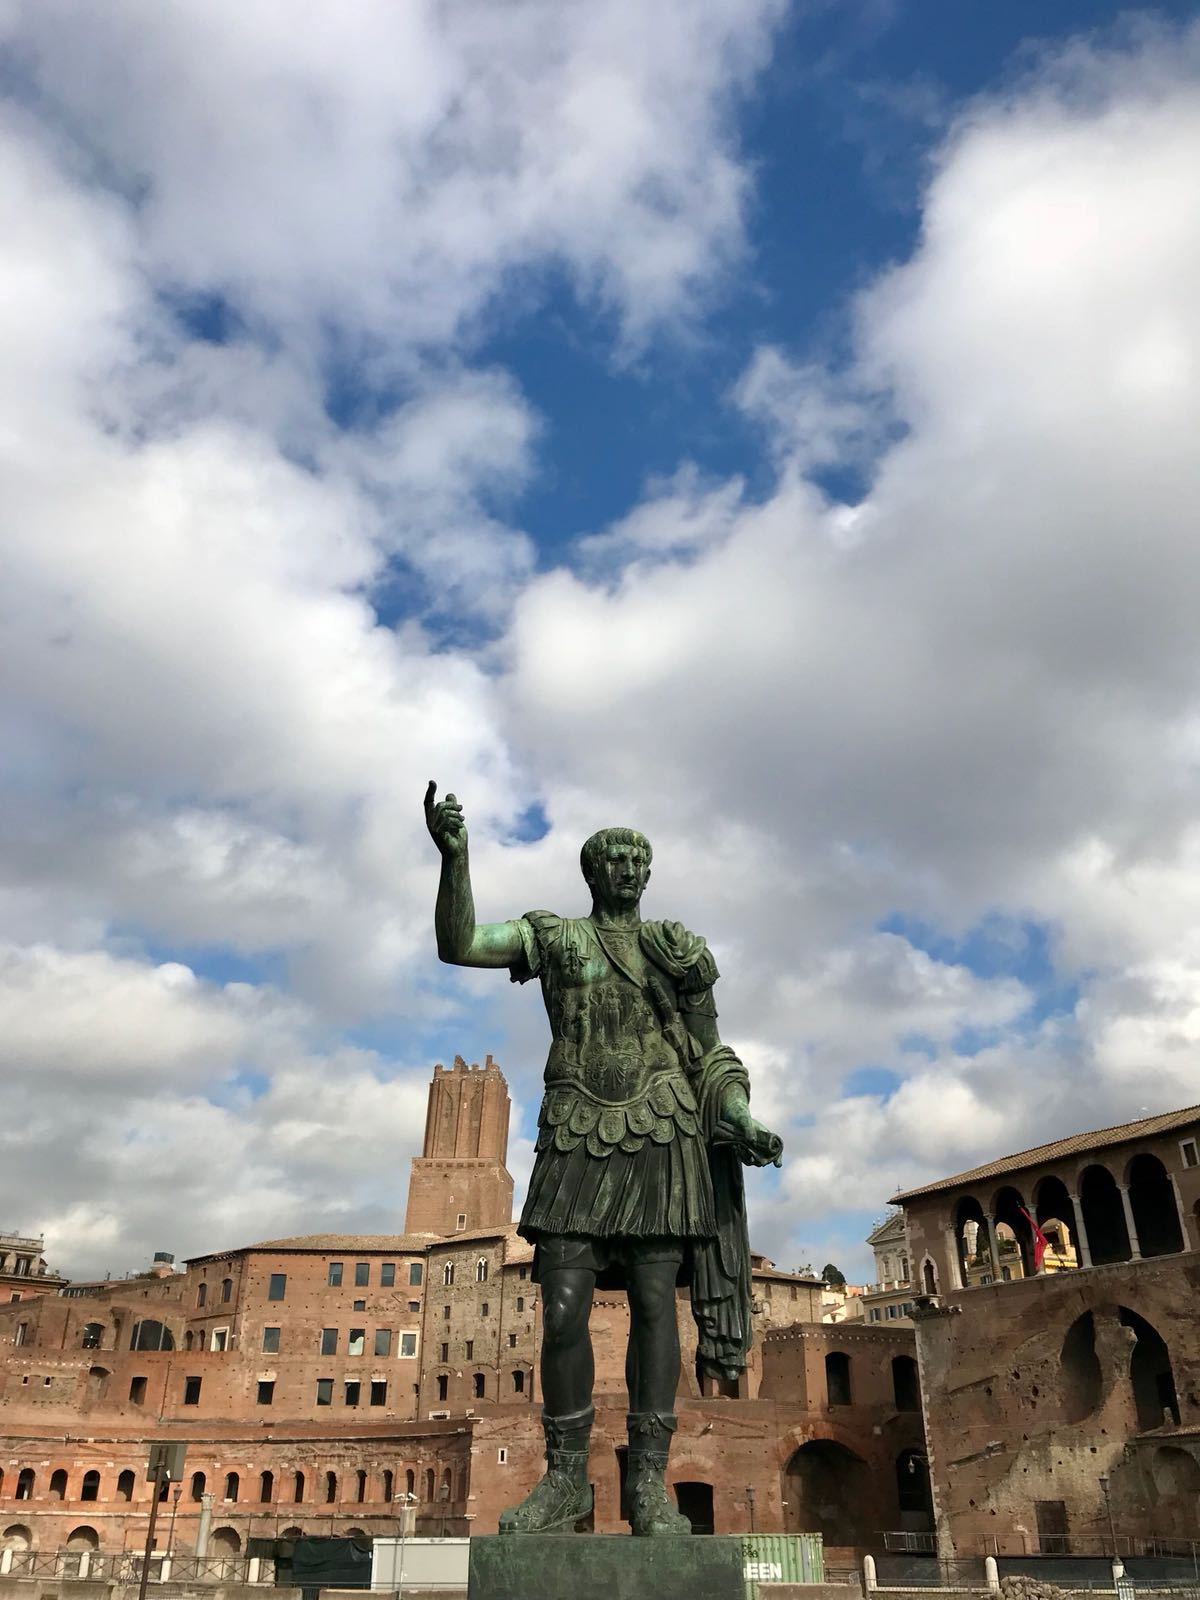 Statue of a Roman emperor standing near the Forum in Rome